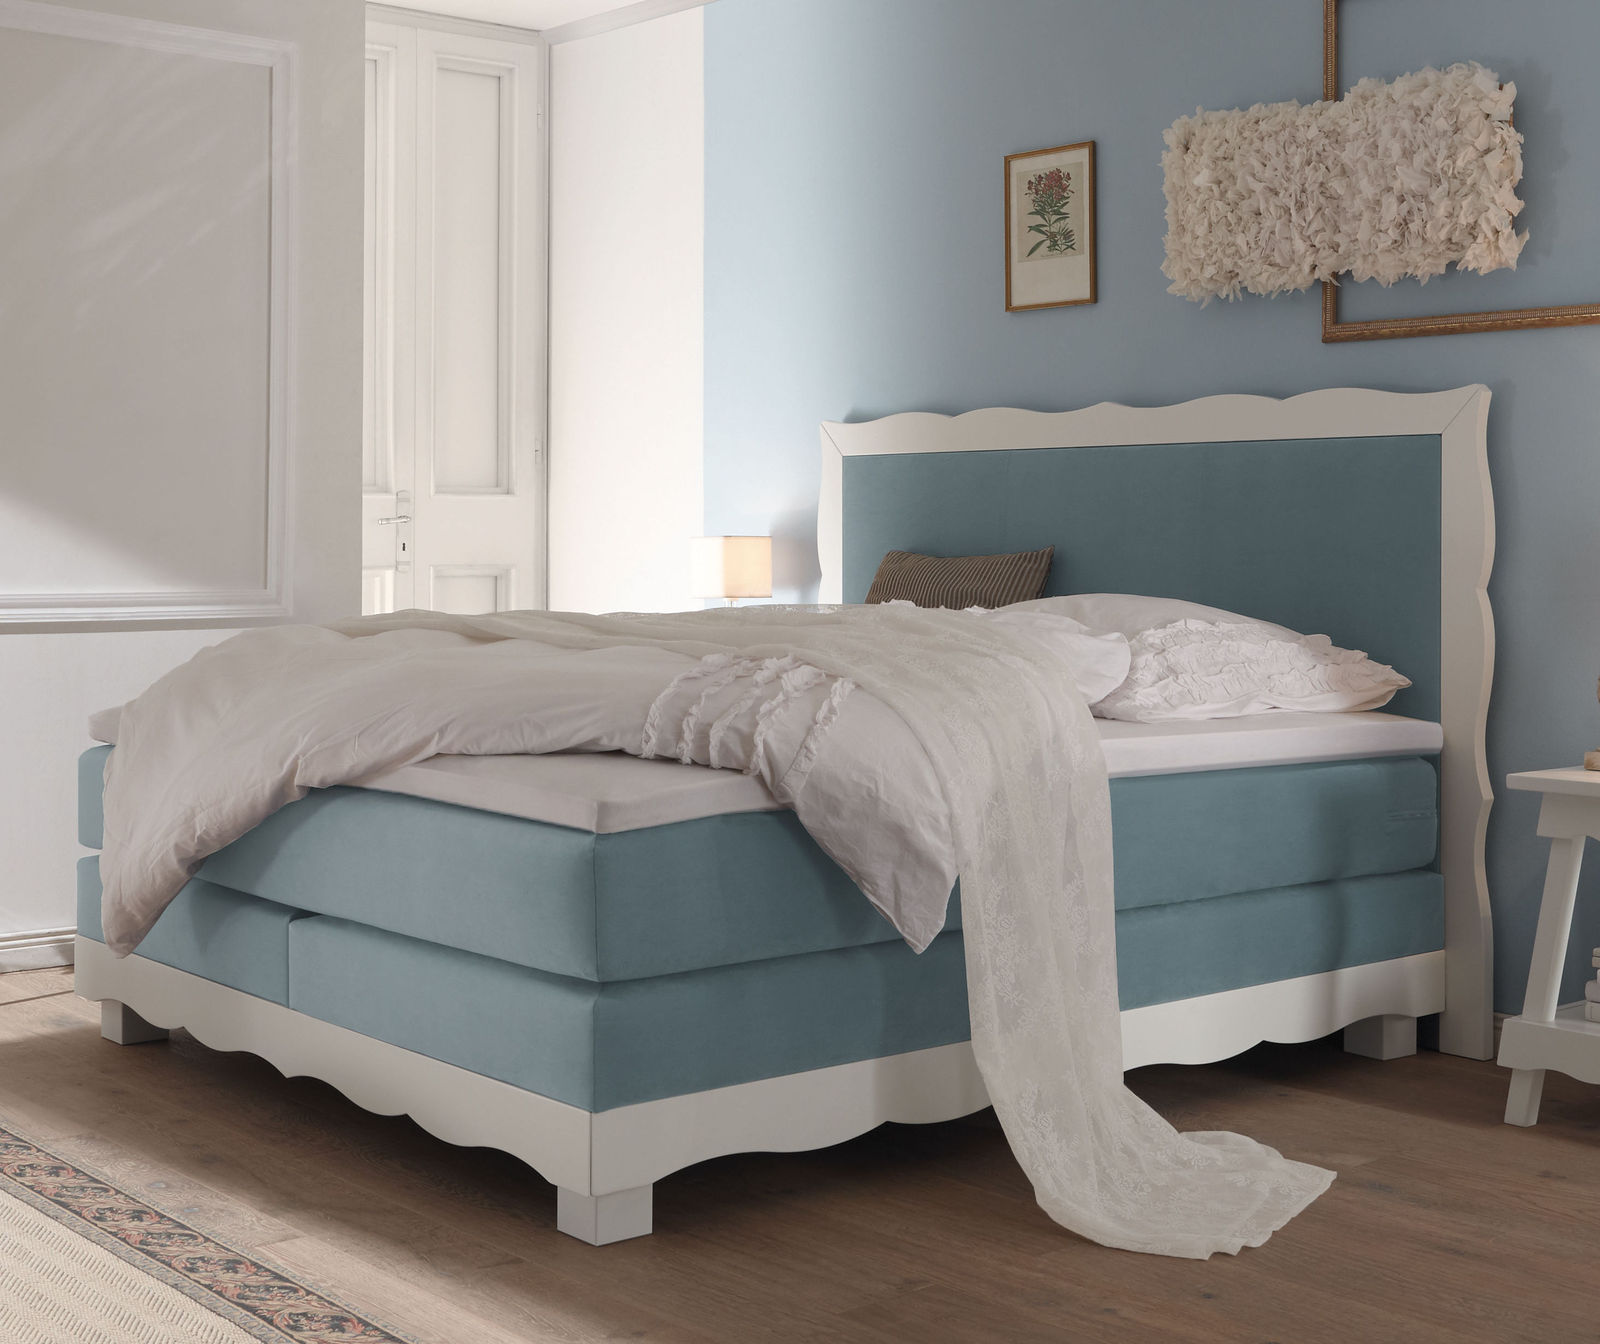 landhausstil boxspringbett romantisch mit samtstoff bezug. Black Bedroom Furniture Sets. Home Design Ideas